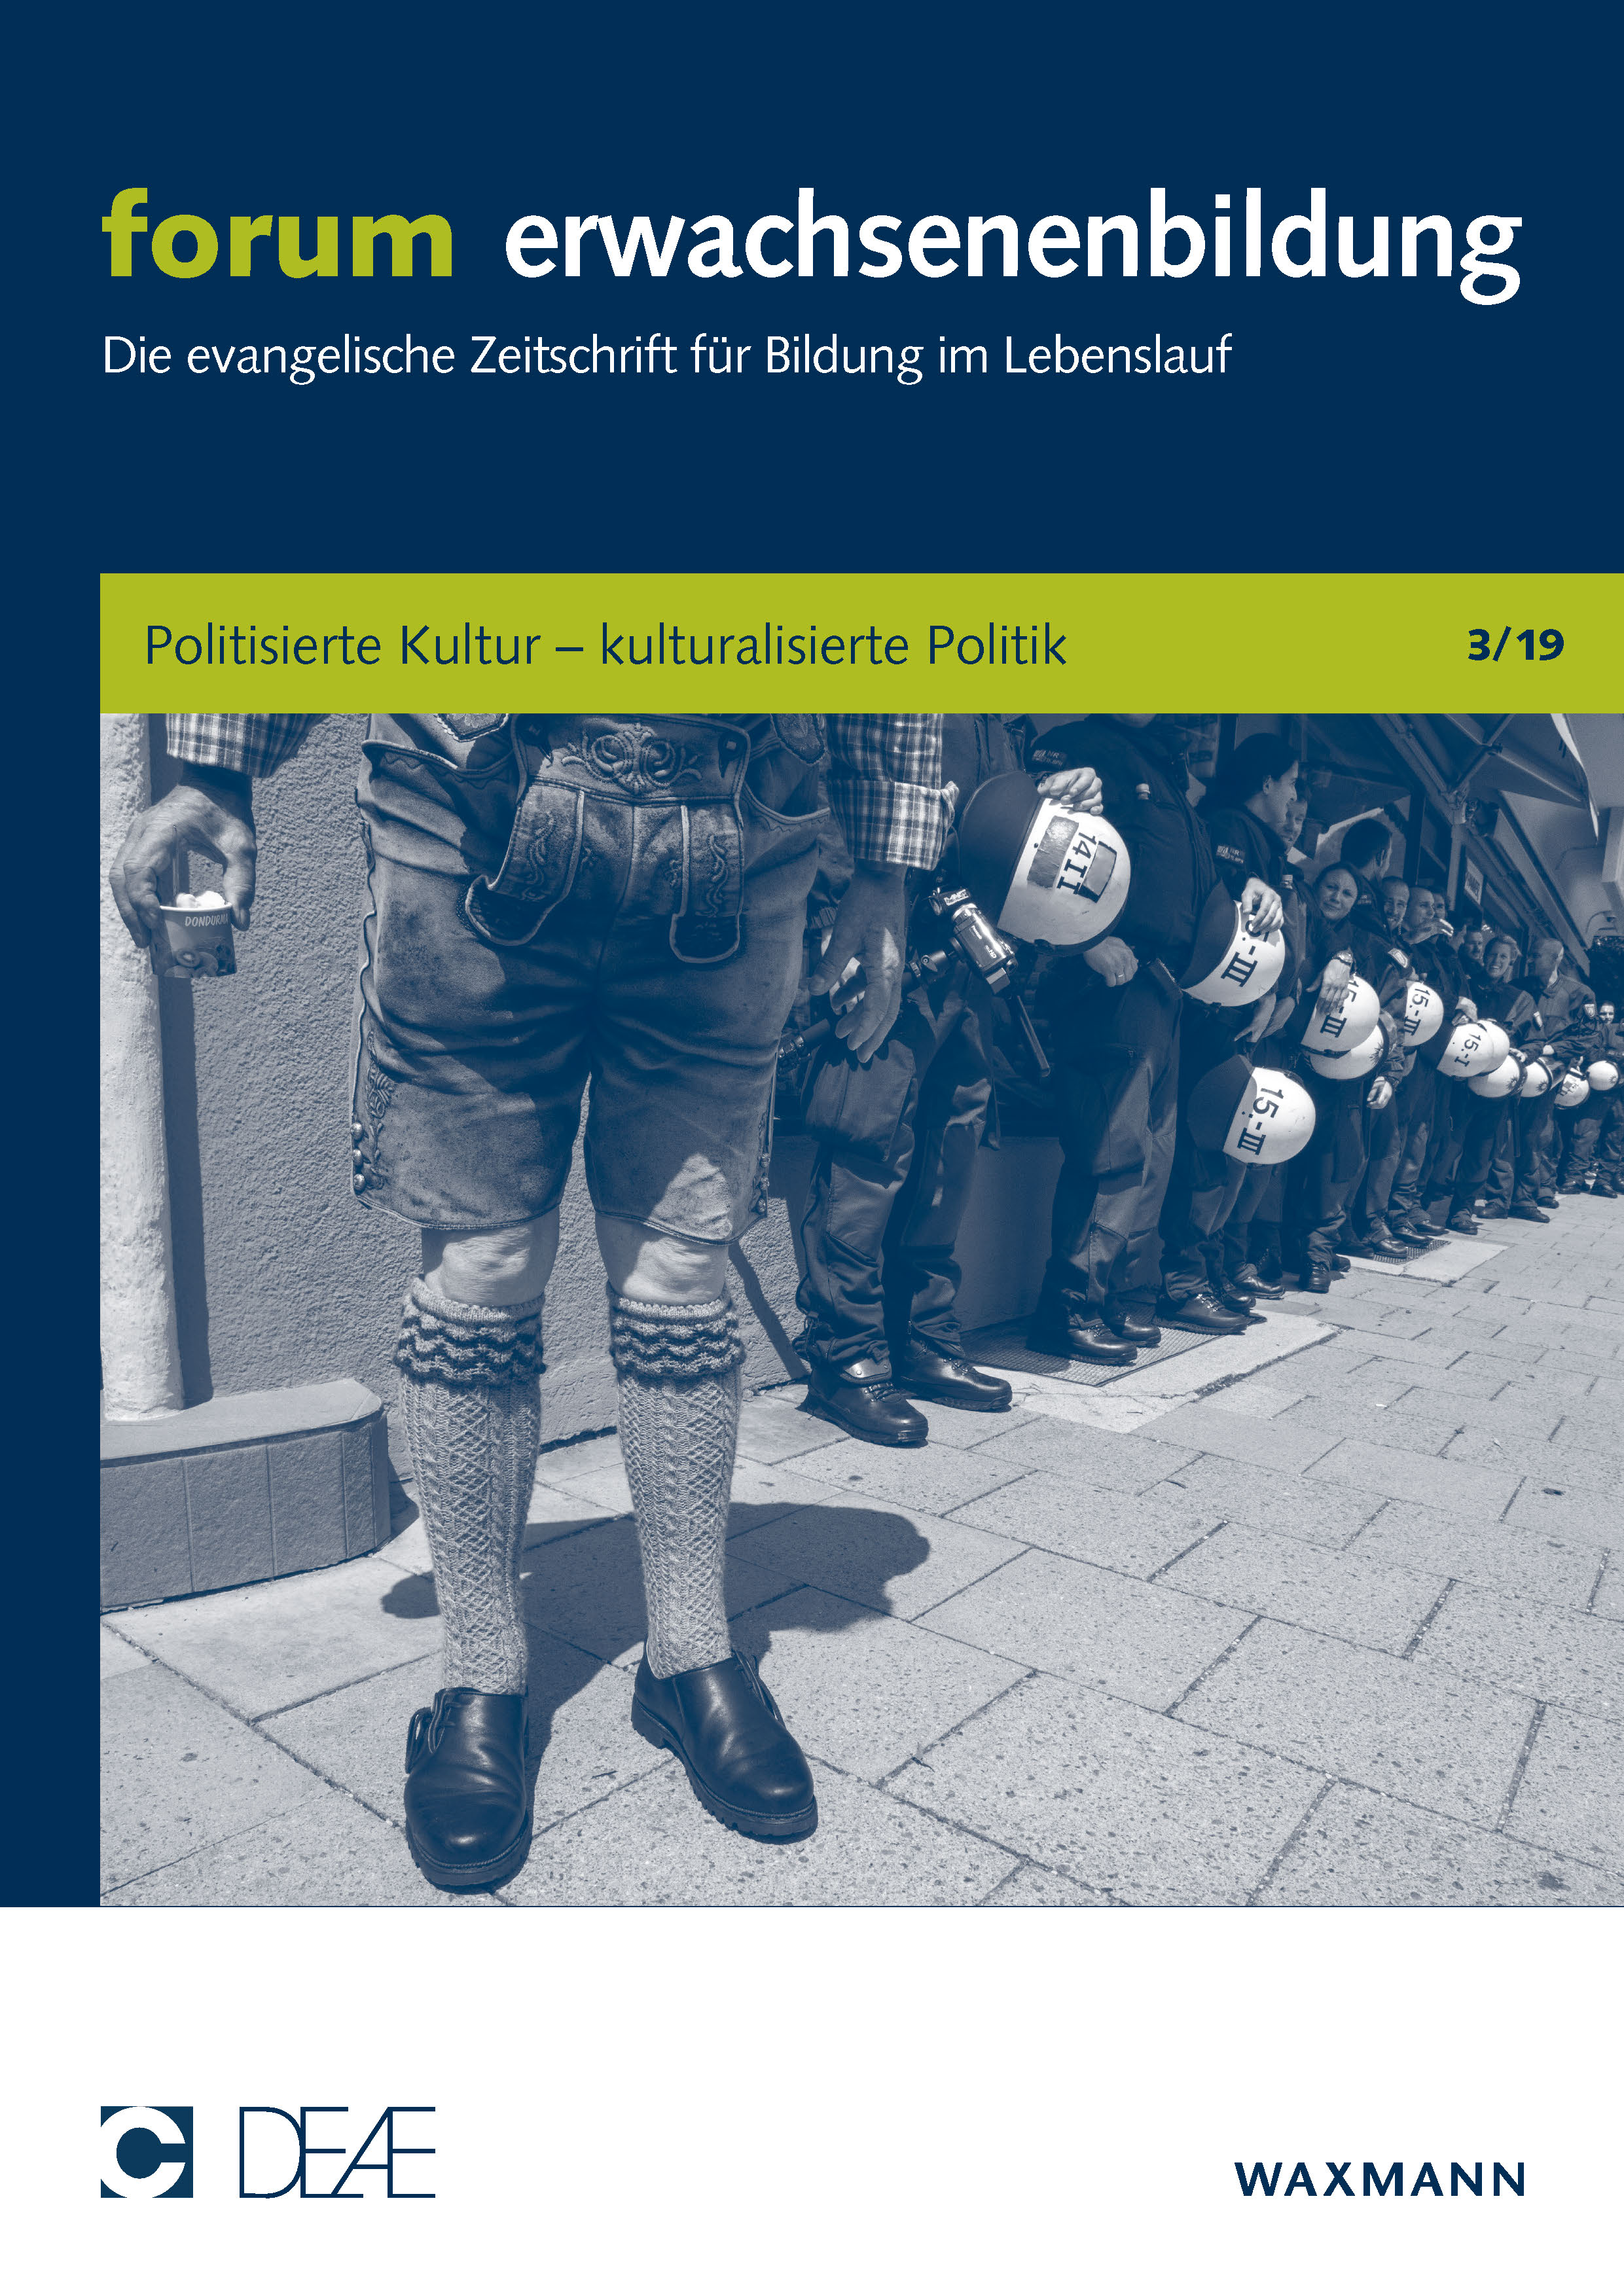 forum erwachsenenbildung: Politisierte Kultur - kulturalisierte Politik